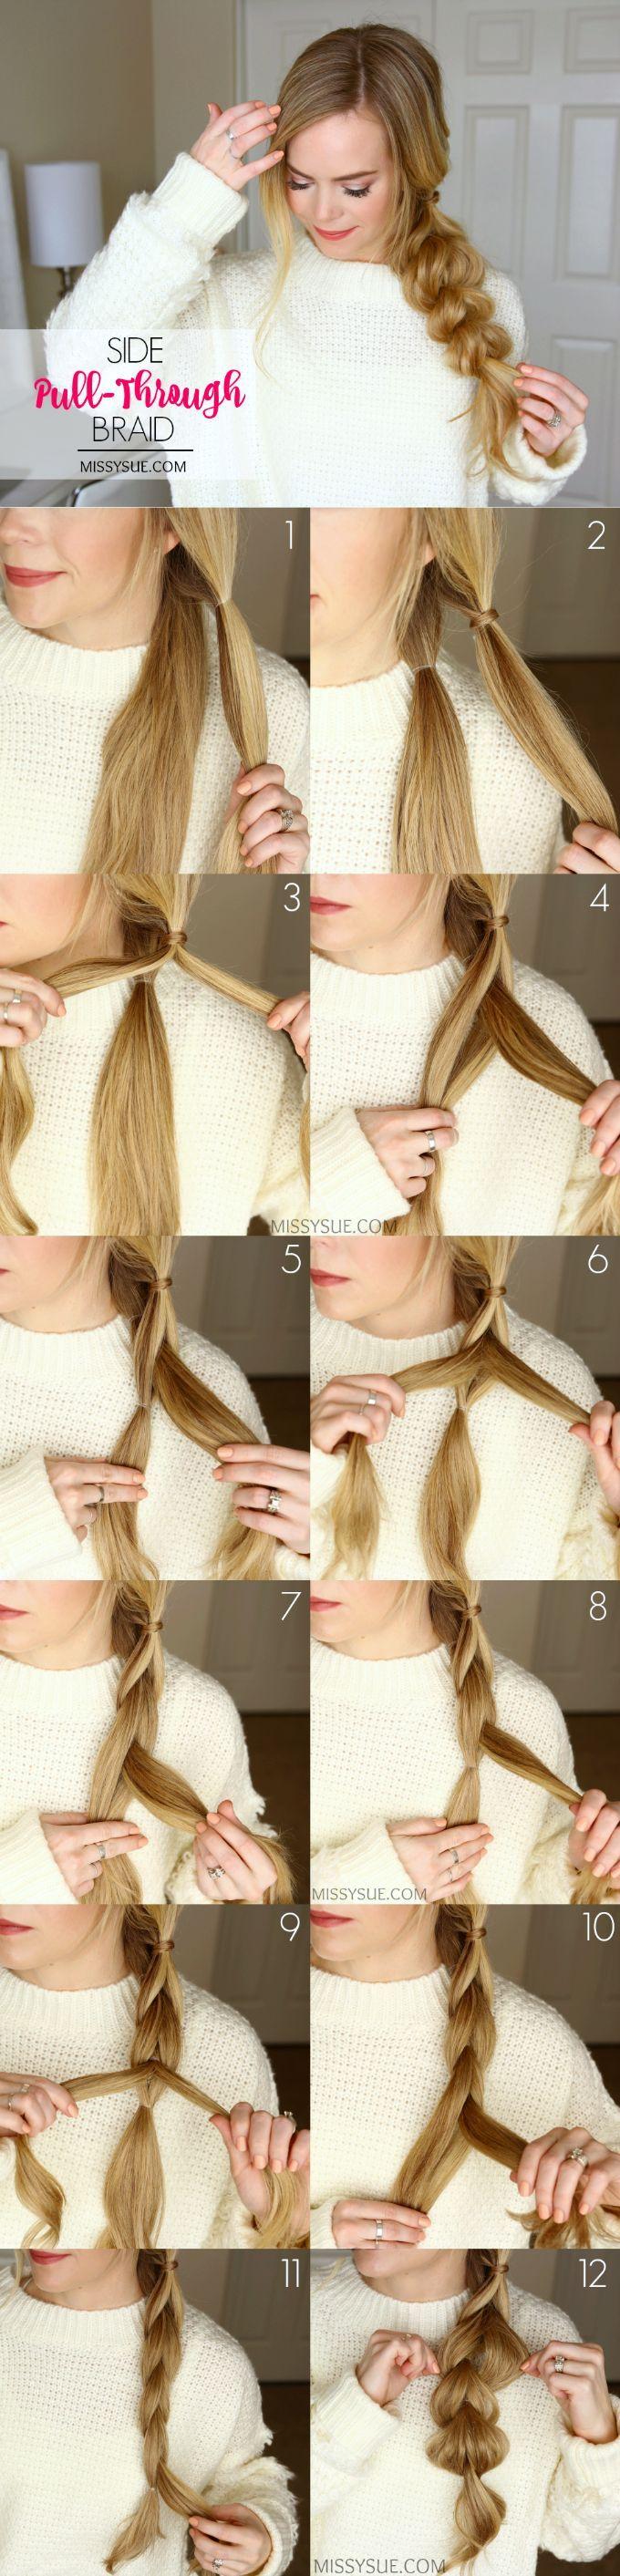 Pullthrubraidhairstyletutorial braid hairstyles wig and